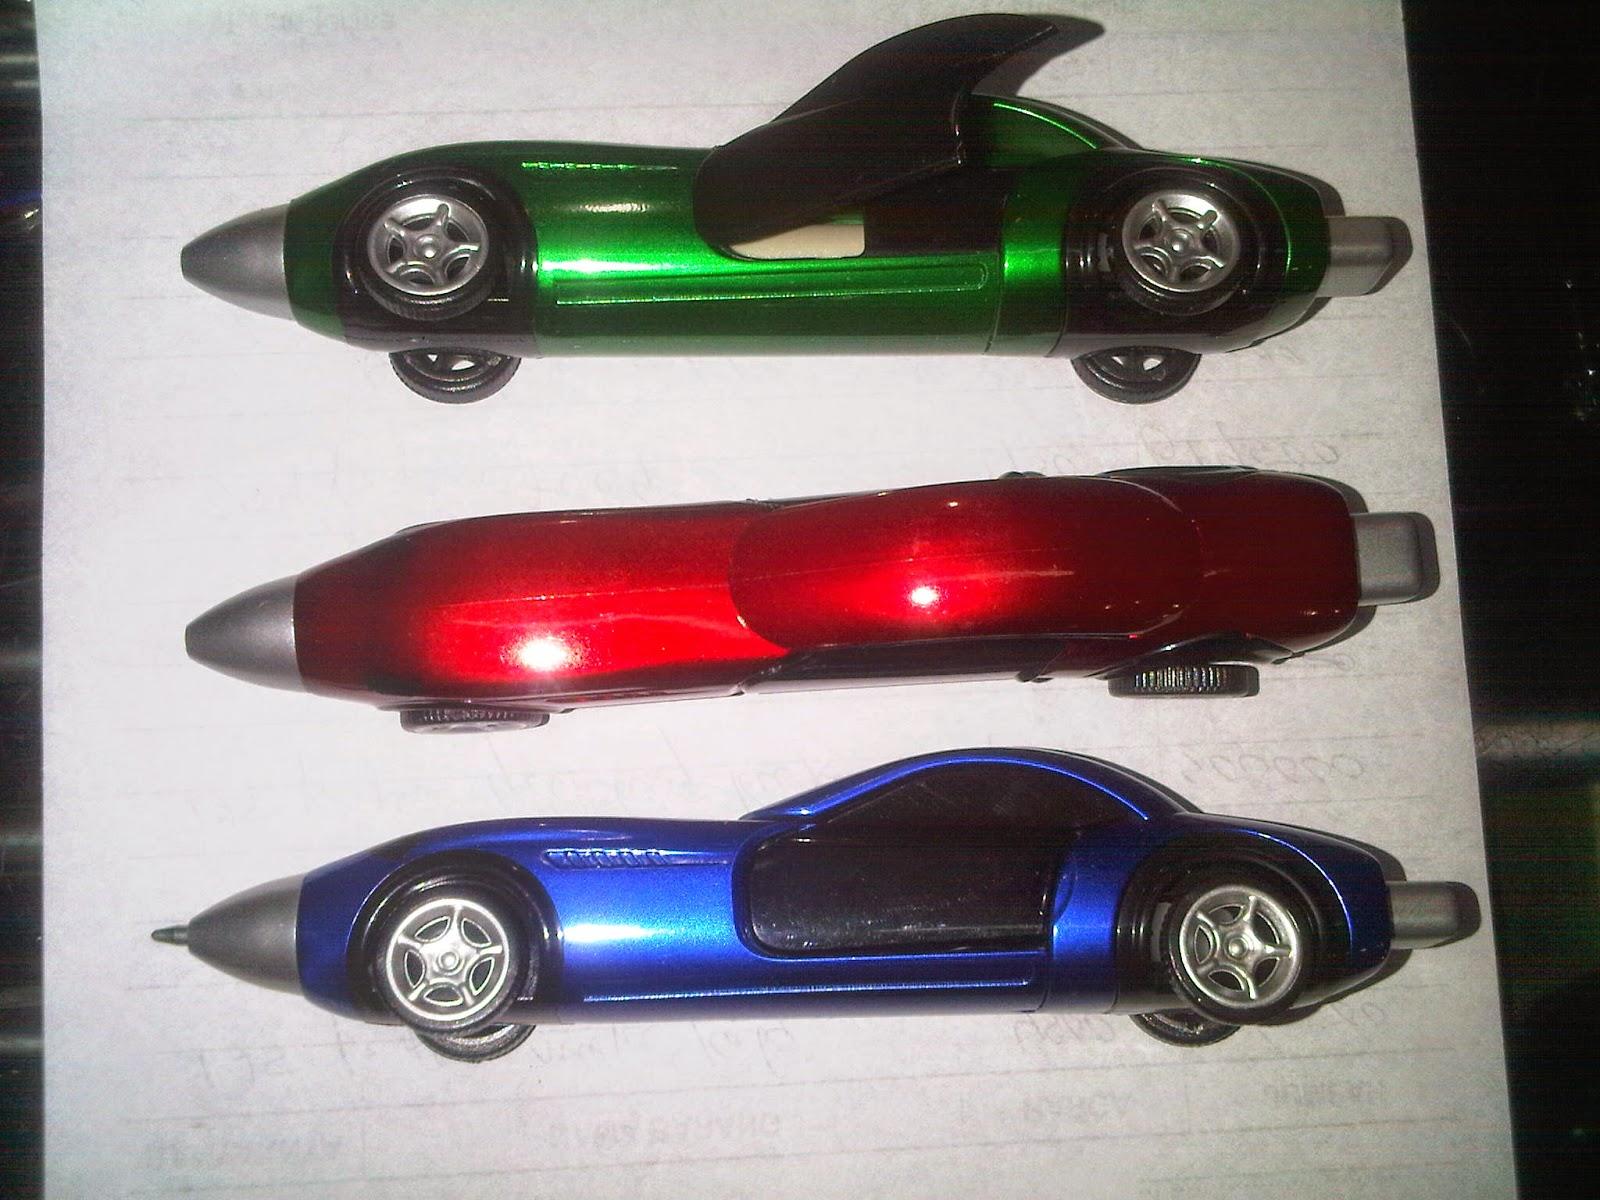 Pulpen murah, pulpen promosi, souvenir pulpen, pen laser, pen grafir, pulpen tali, pen sablon, pen promosi